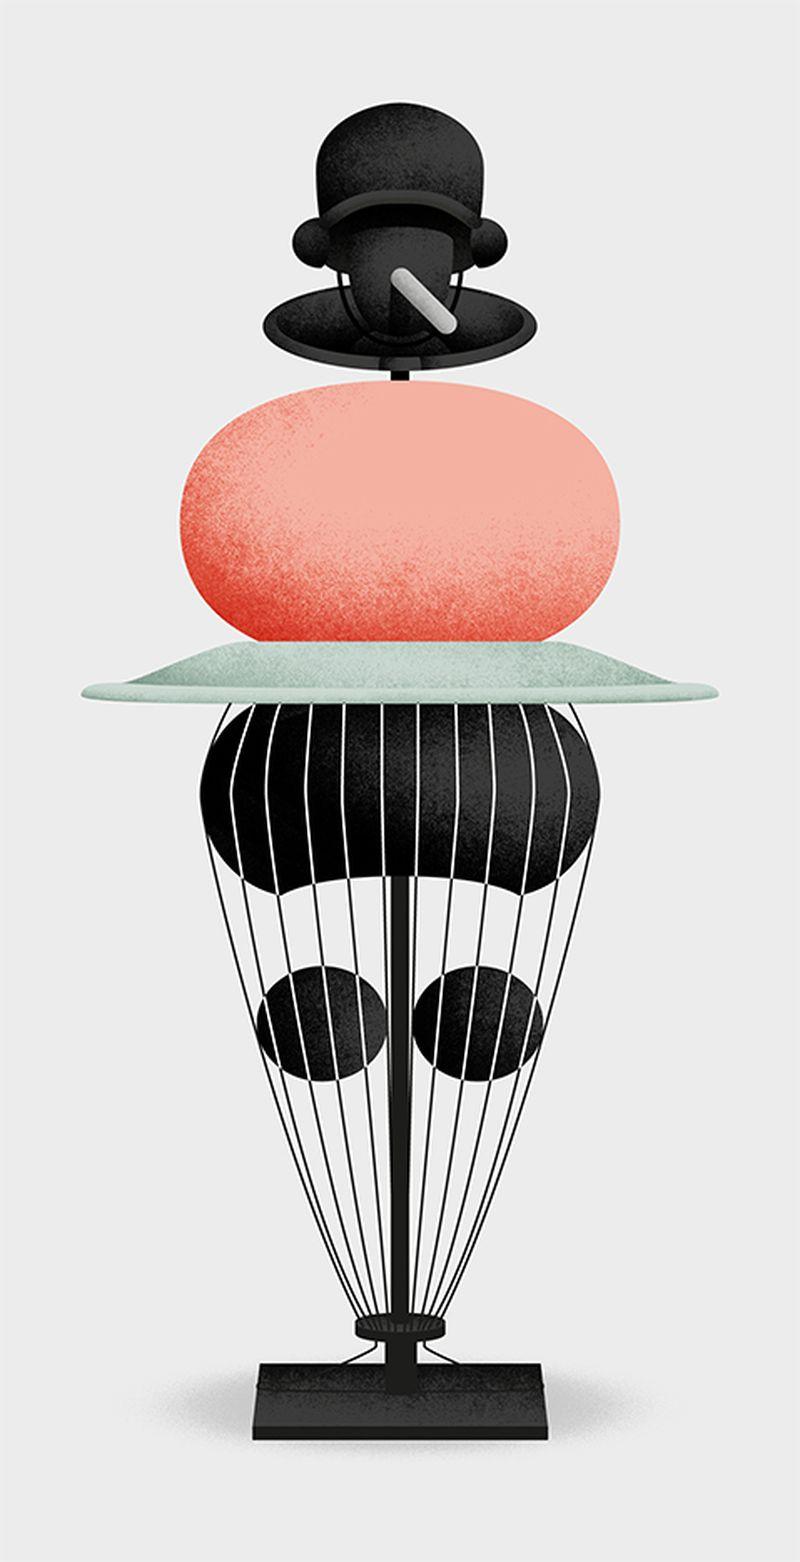 image: martin nicolausson by oculto